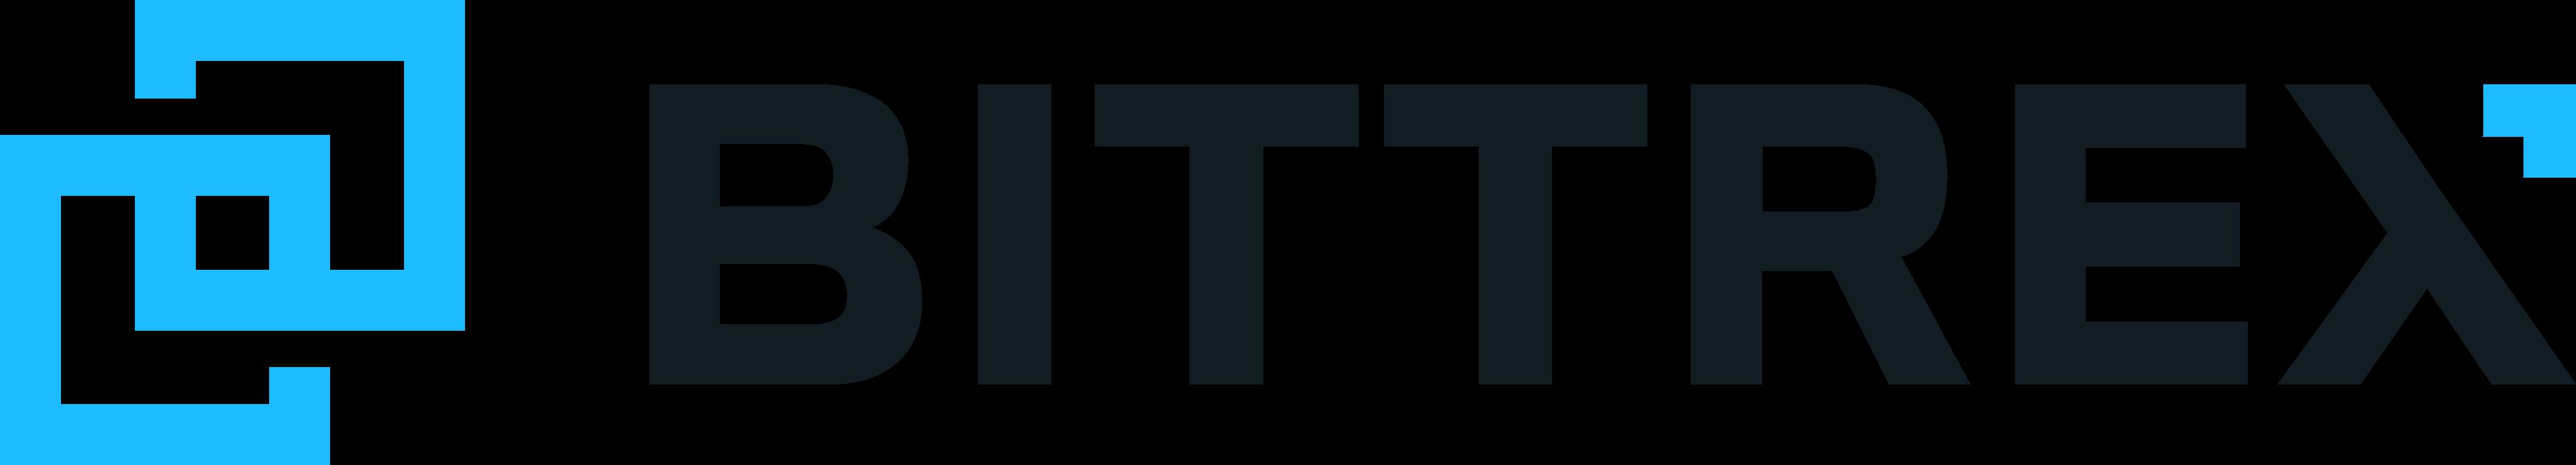 Bittrex - GoldenGoose partner logo image